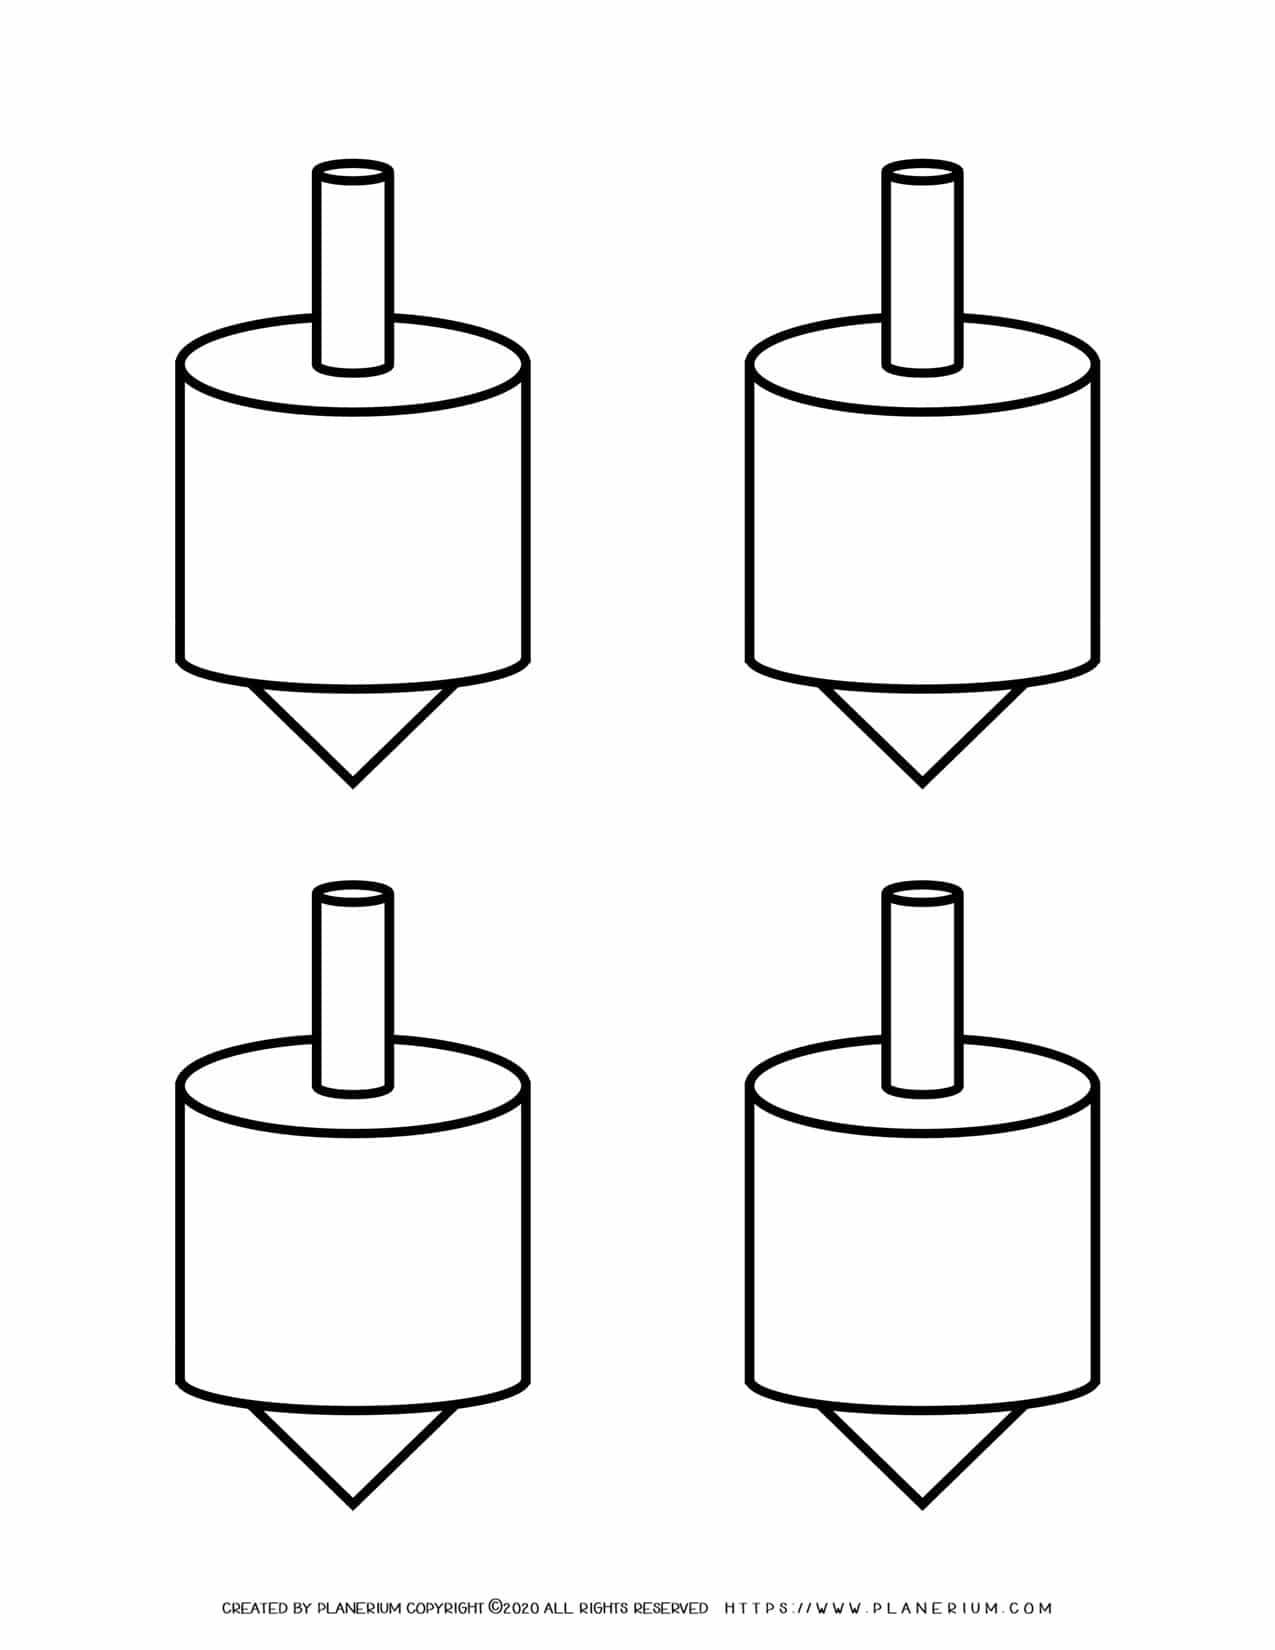 Templates - Four Dreidels | Planerium